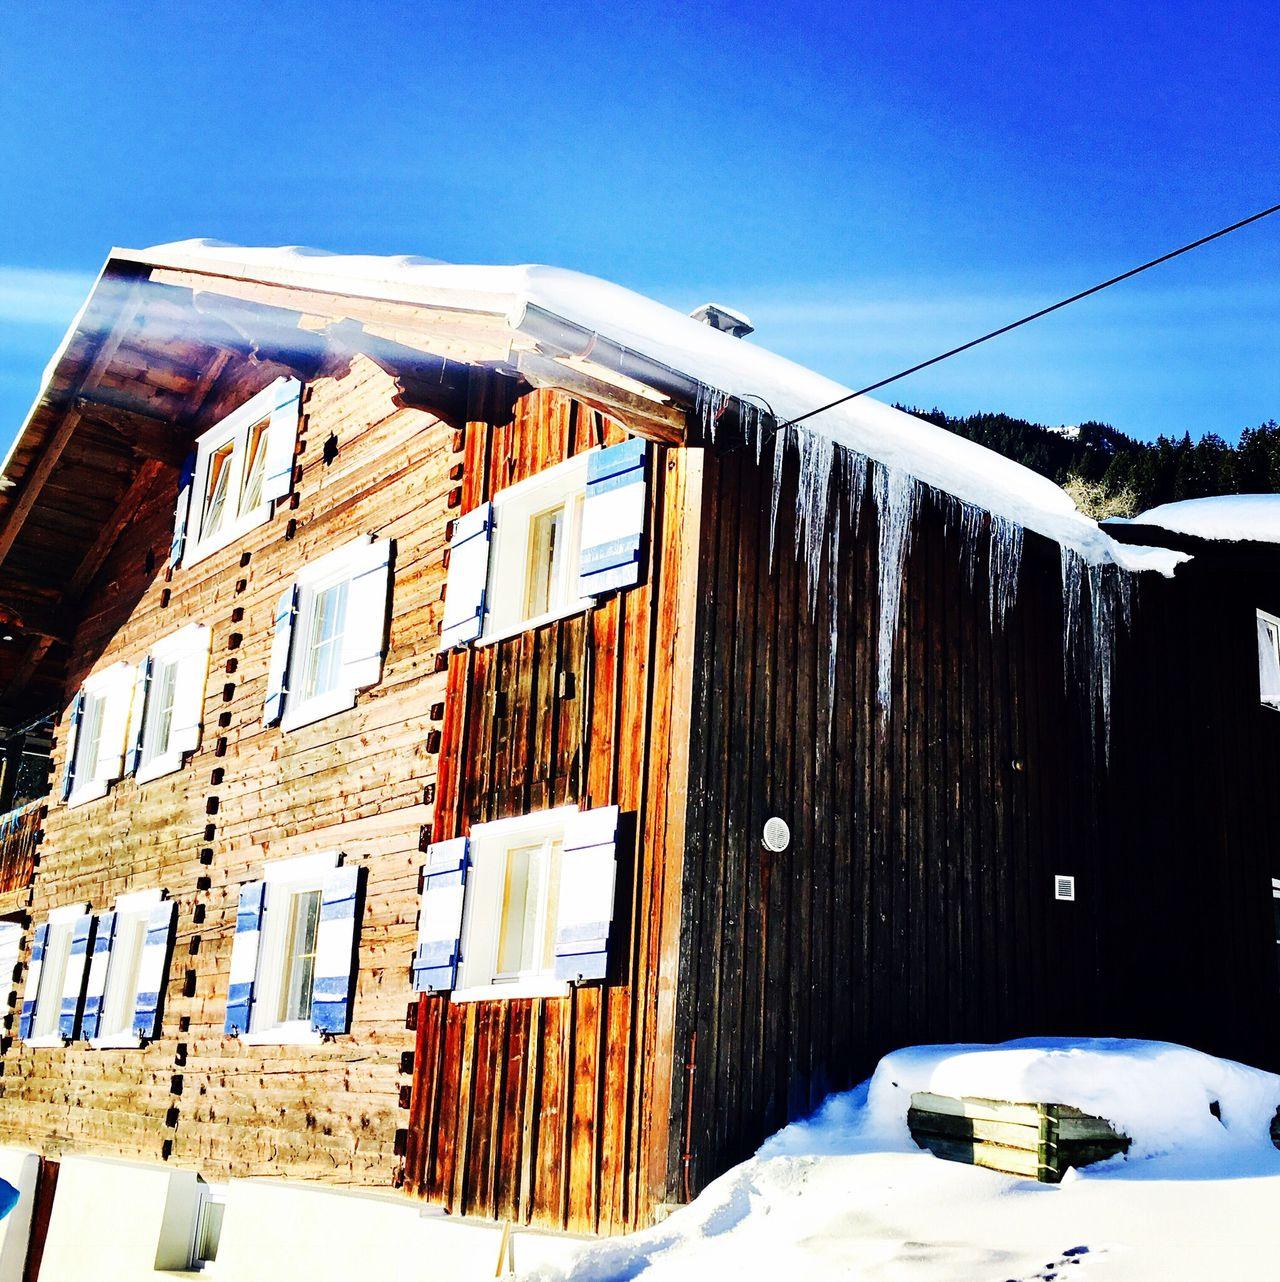 Chalet Winter Snow Clear Sky Outdoors Chalet Hütte